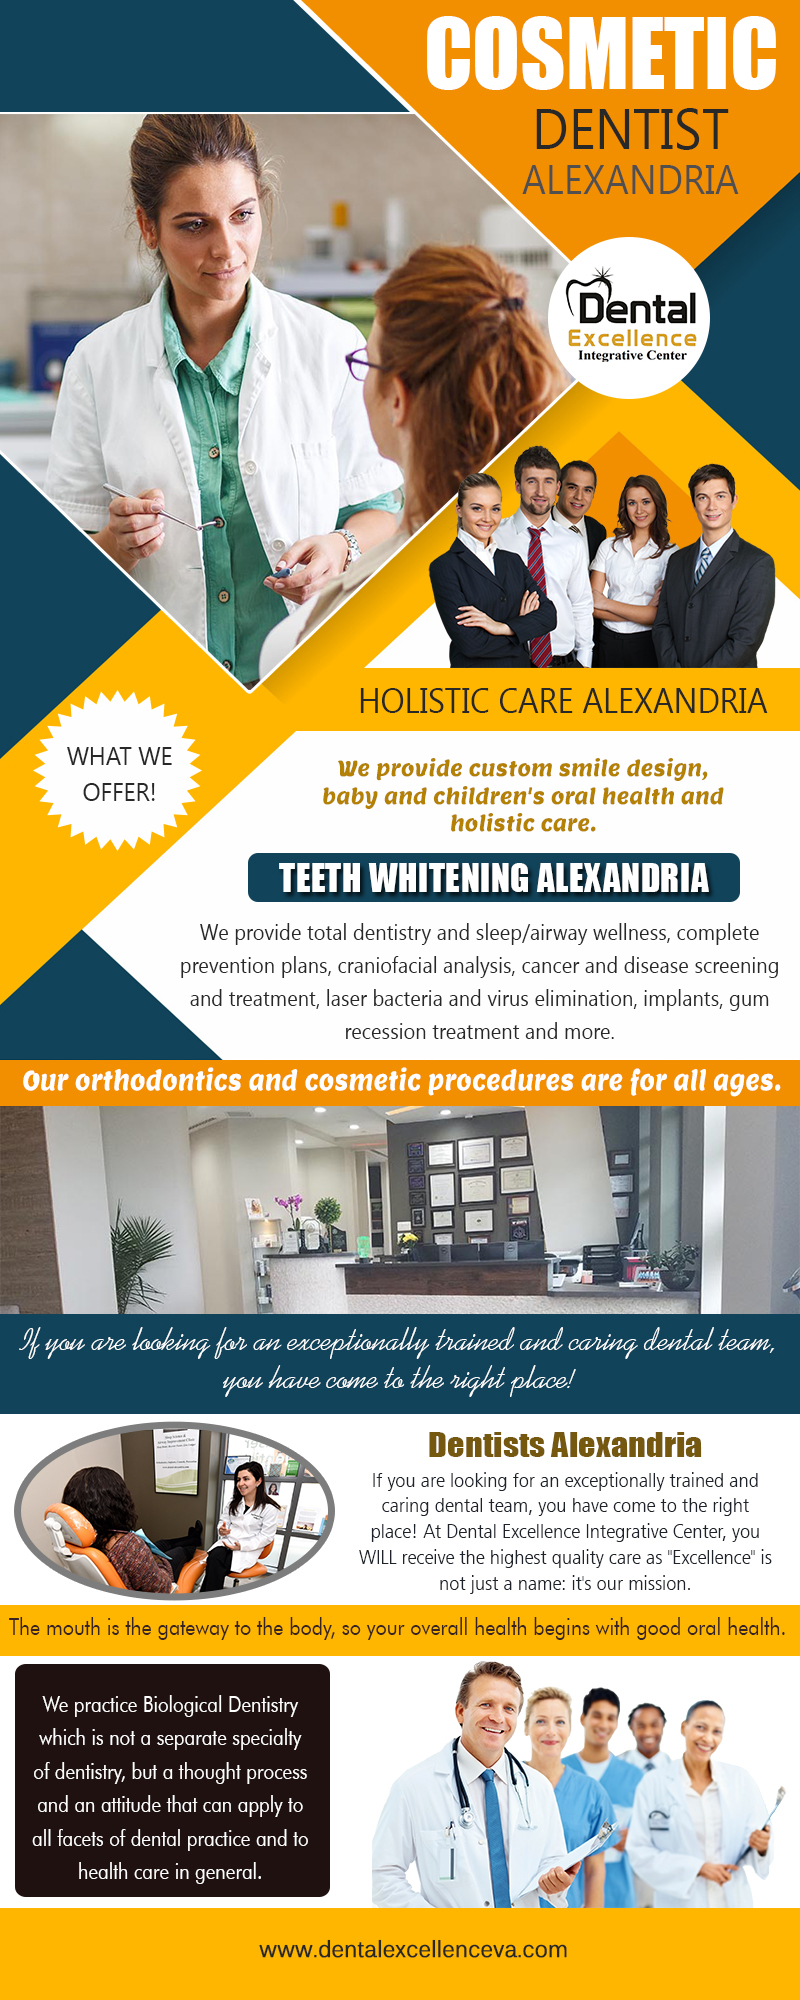 Cosmetic dentist Alexandria